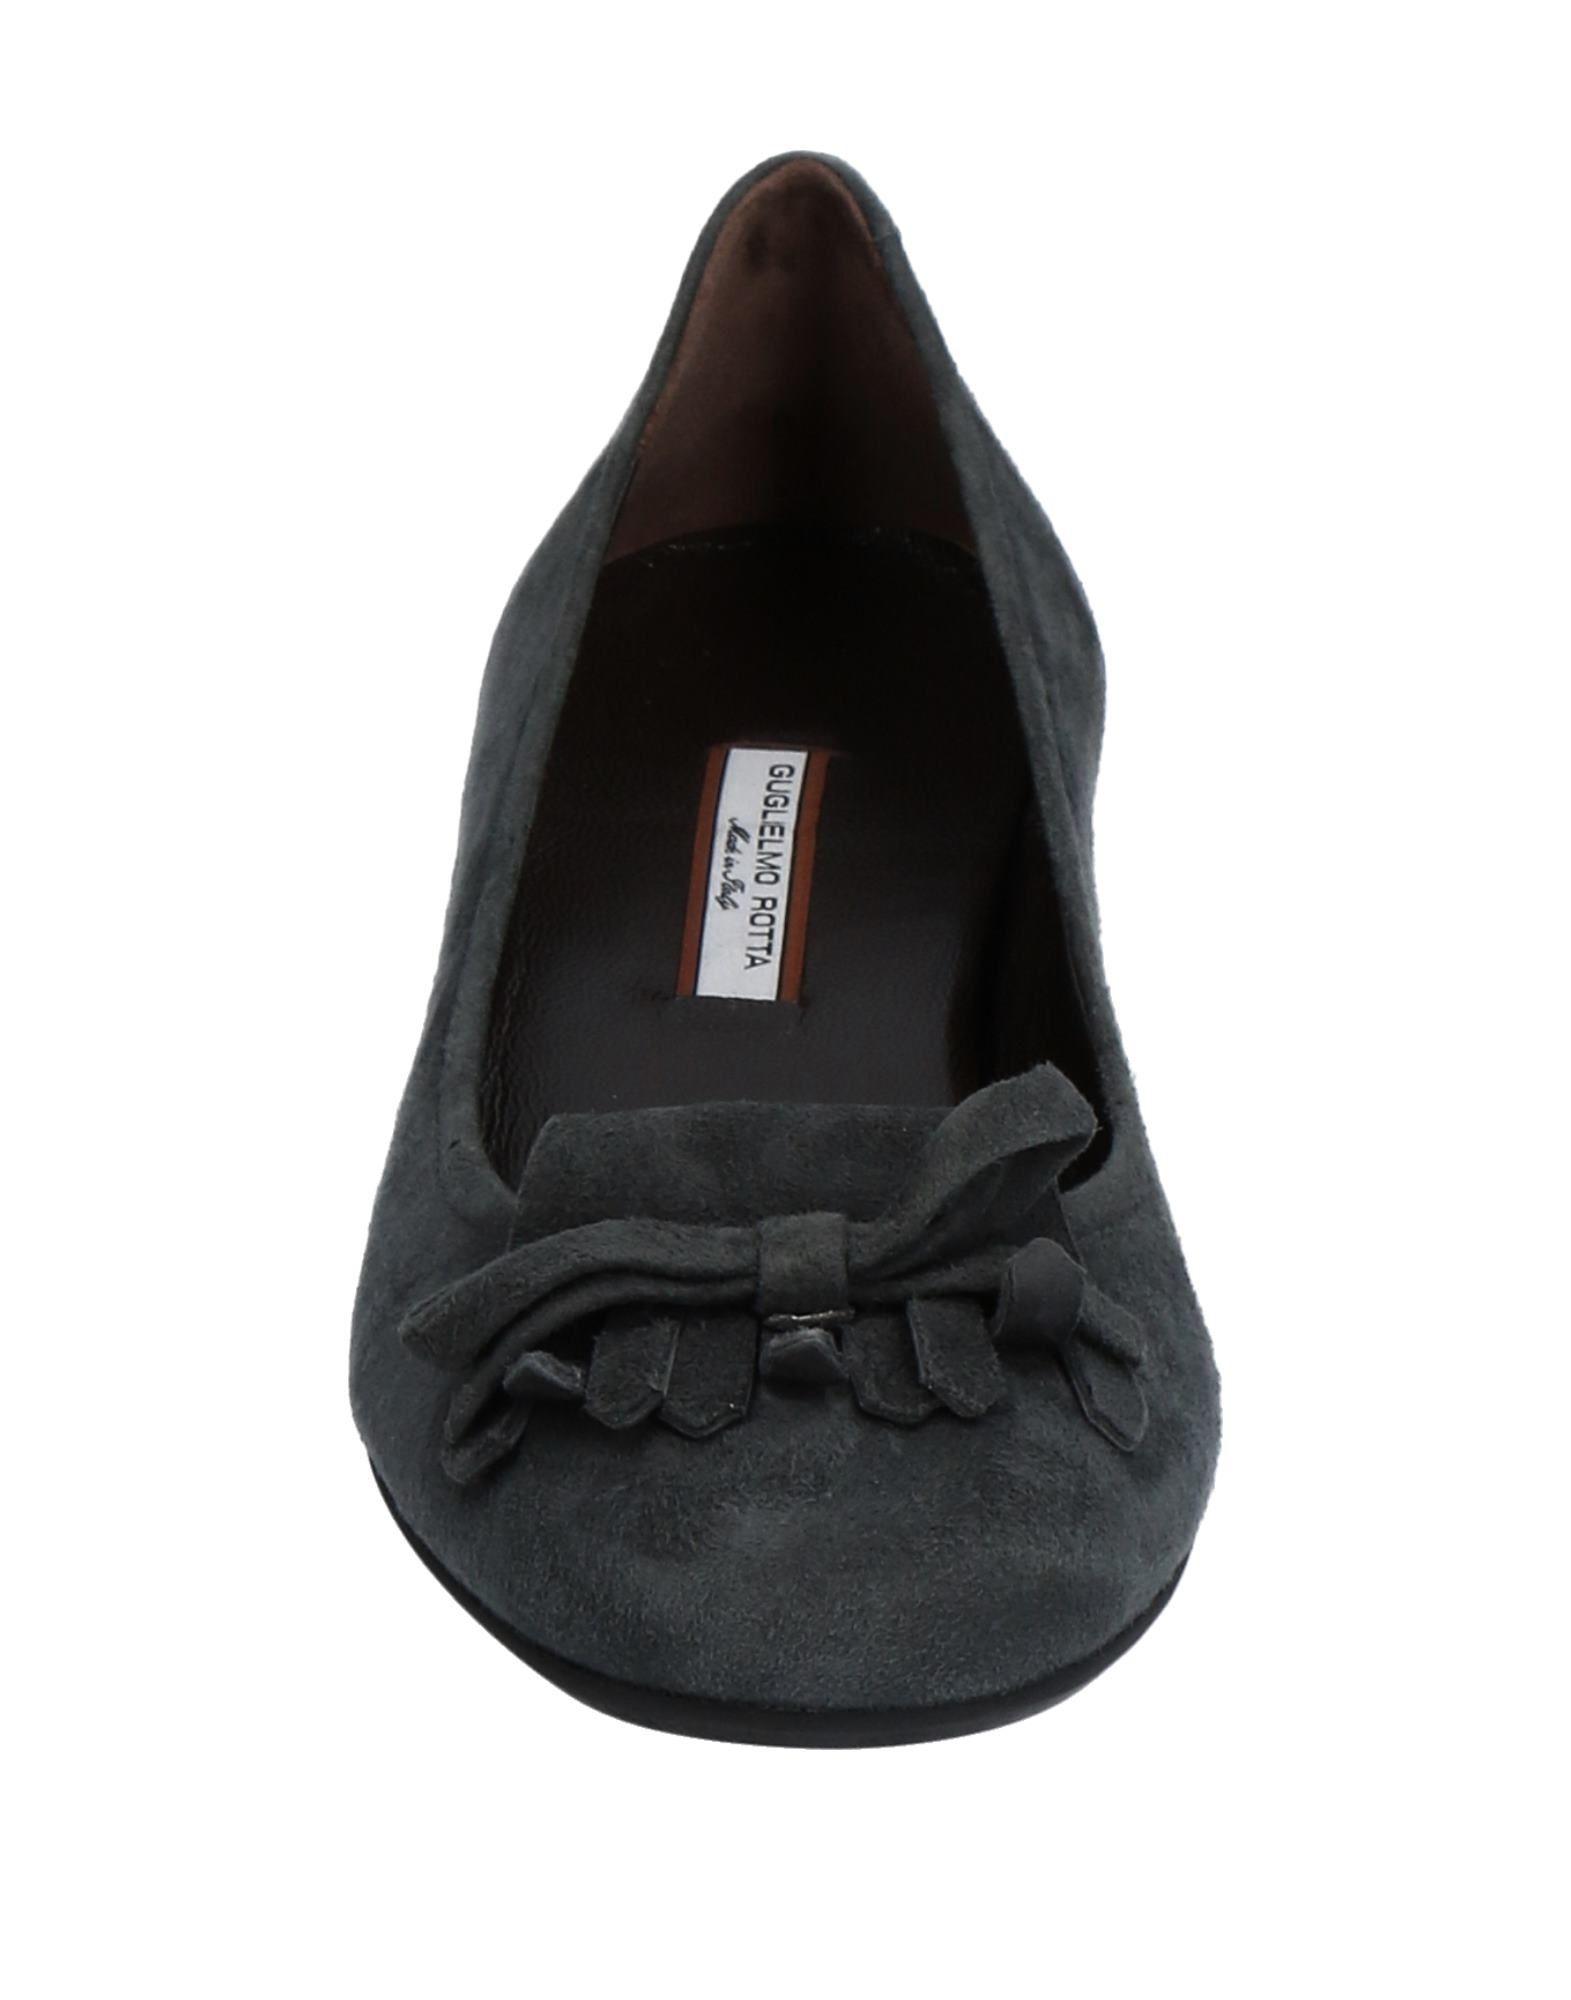 Guglielmo Rotta Ballerinas Damen  11531726FI Gute Qualität beliebte Schuhe